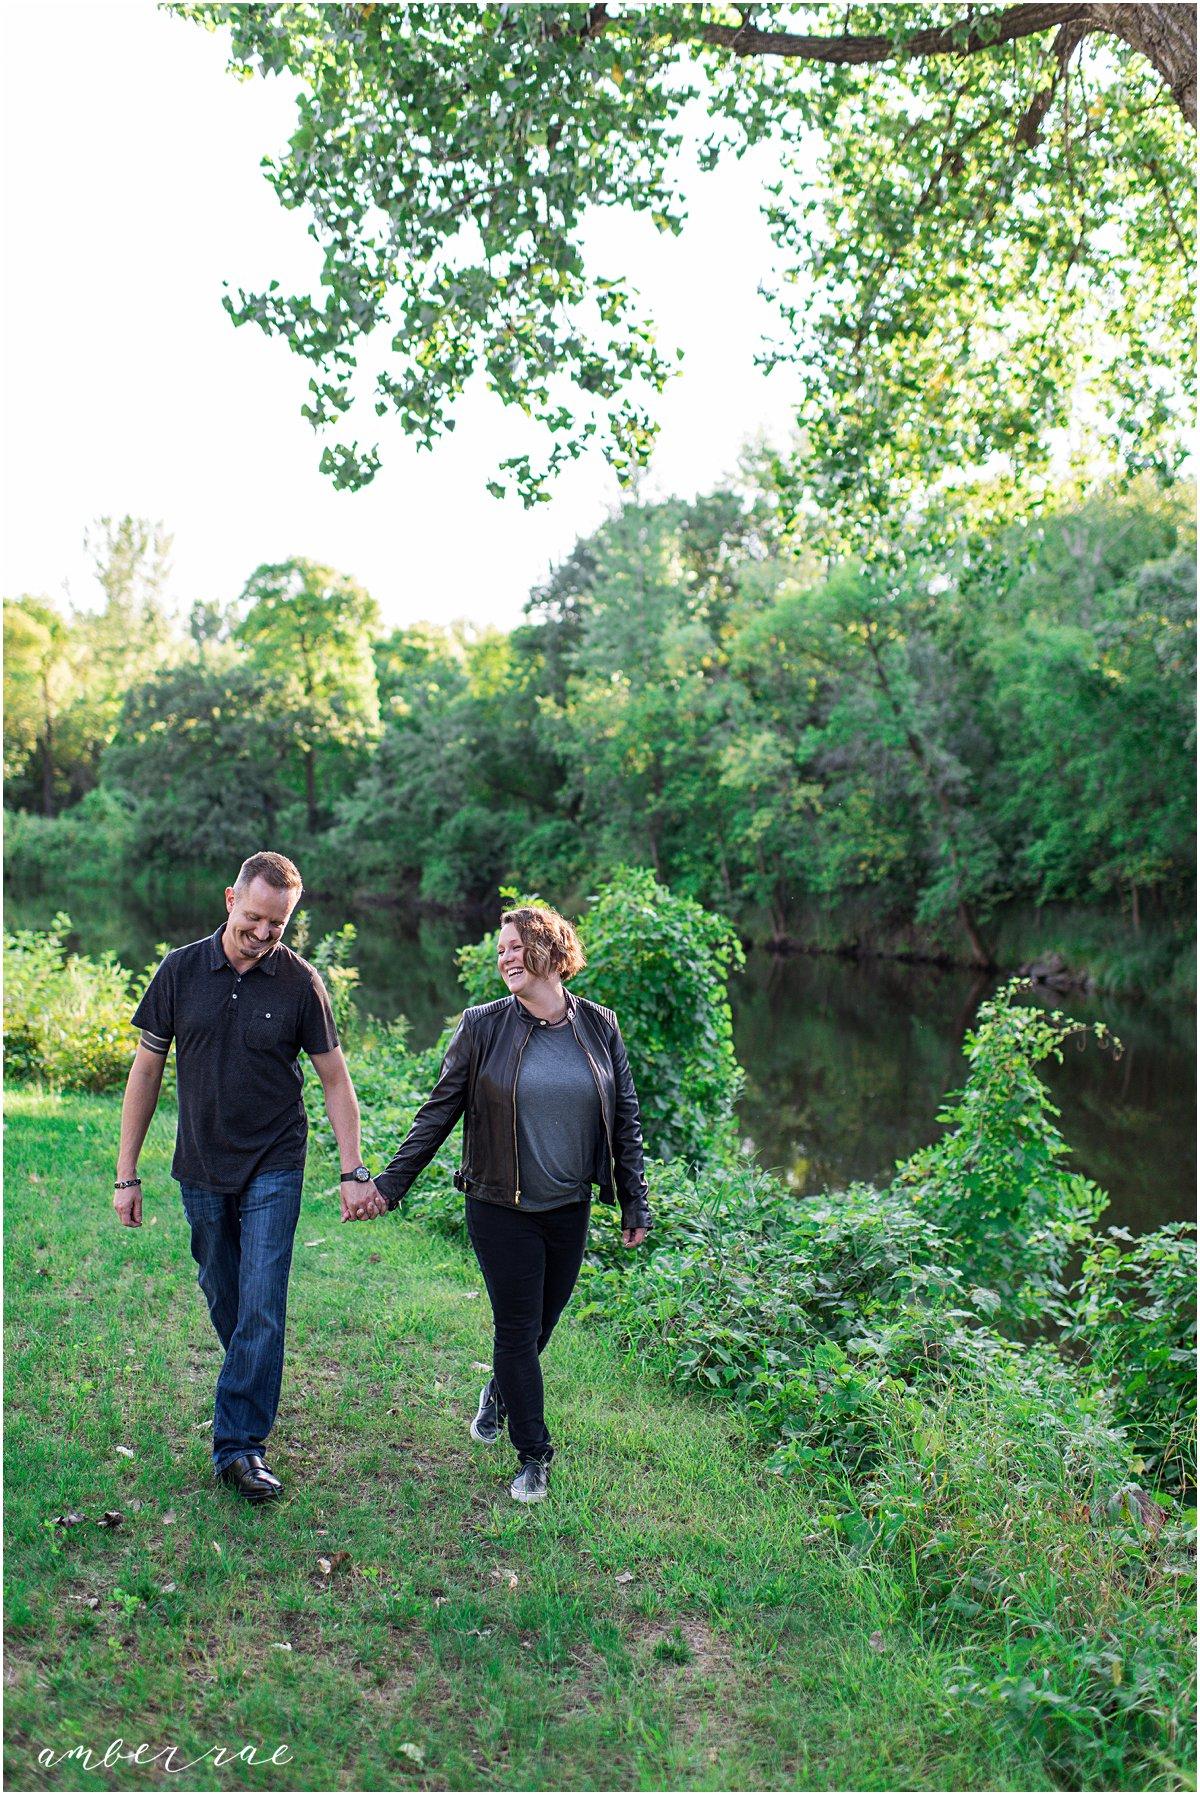 Lance and Amber Engagement Sept 2018_0006.jpg